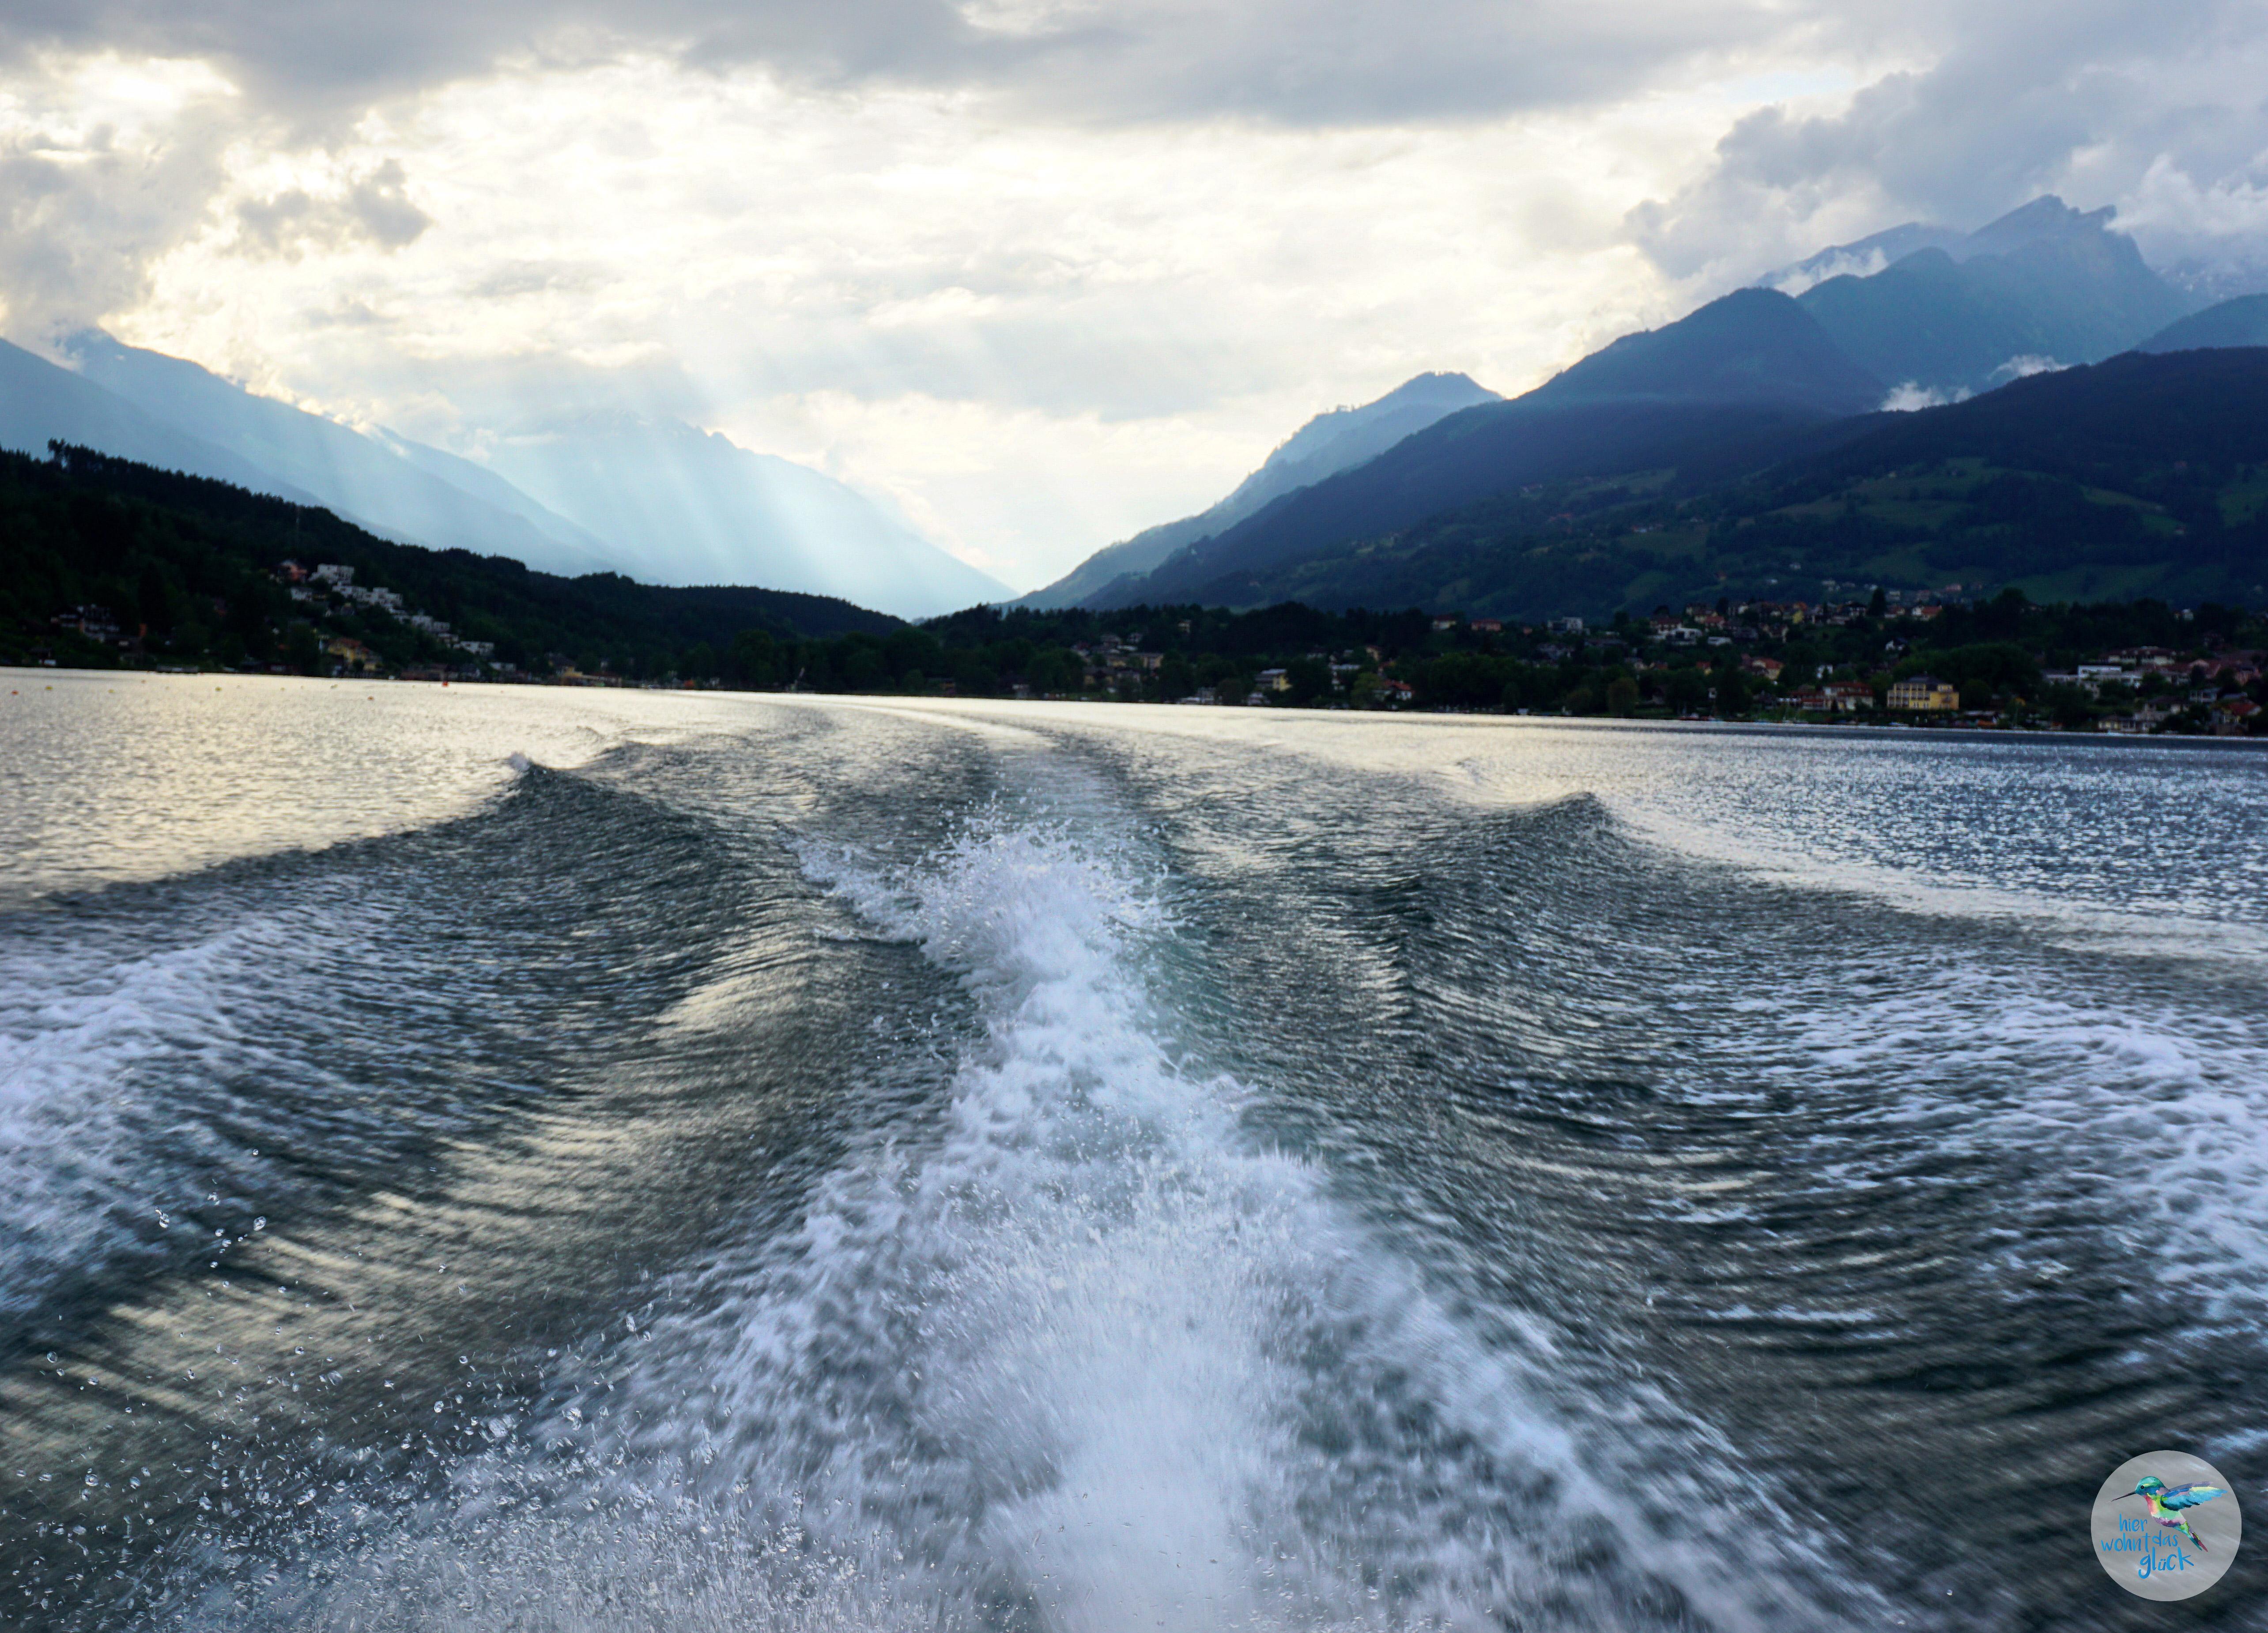 Bootsfahrt am Millstätter See